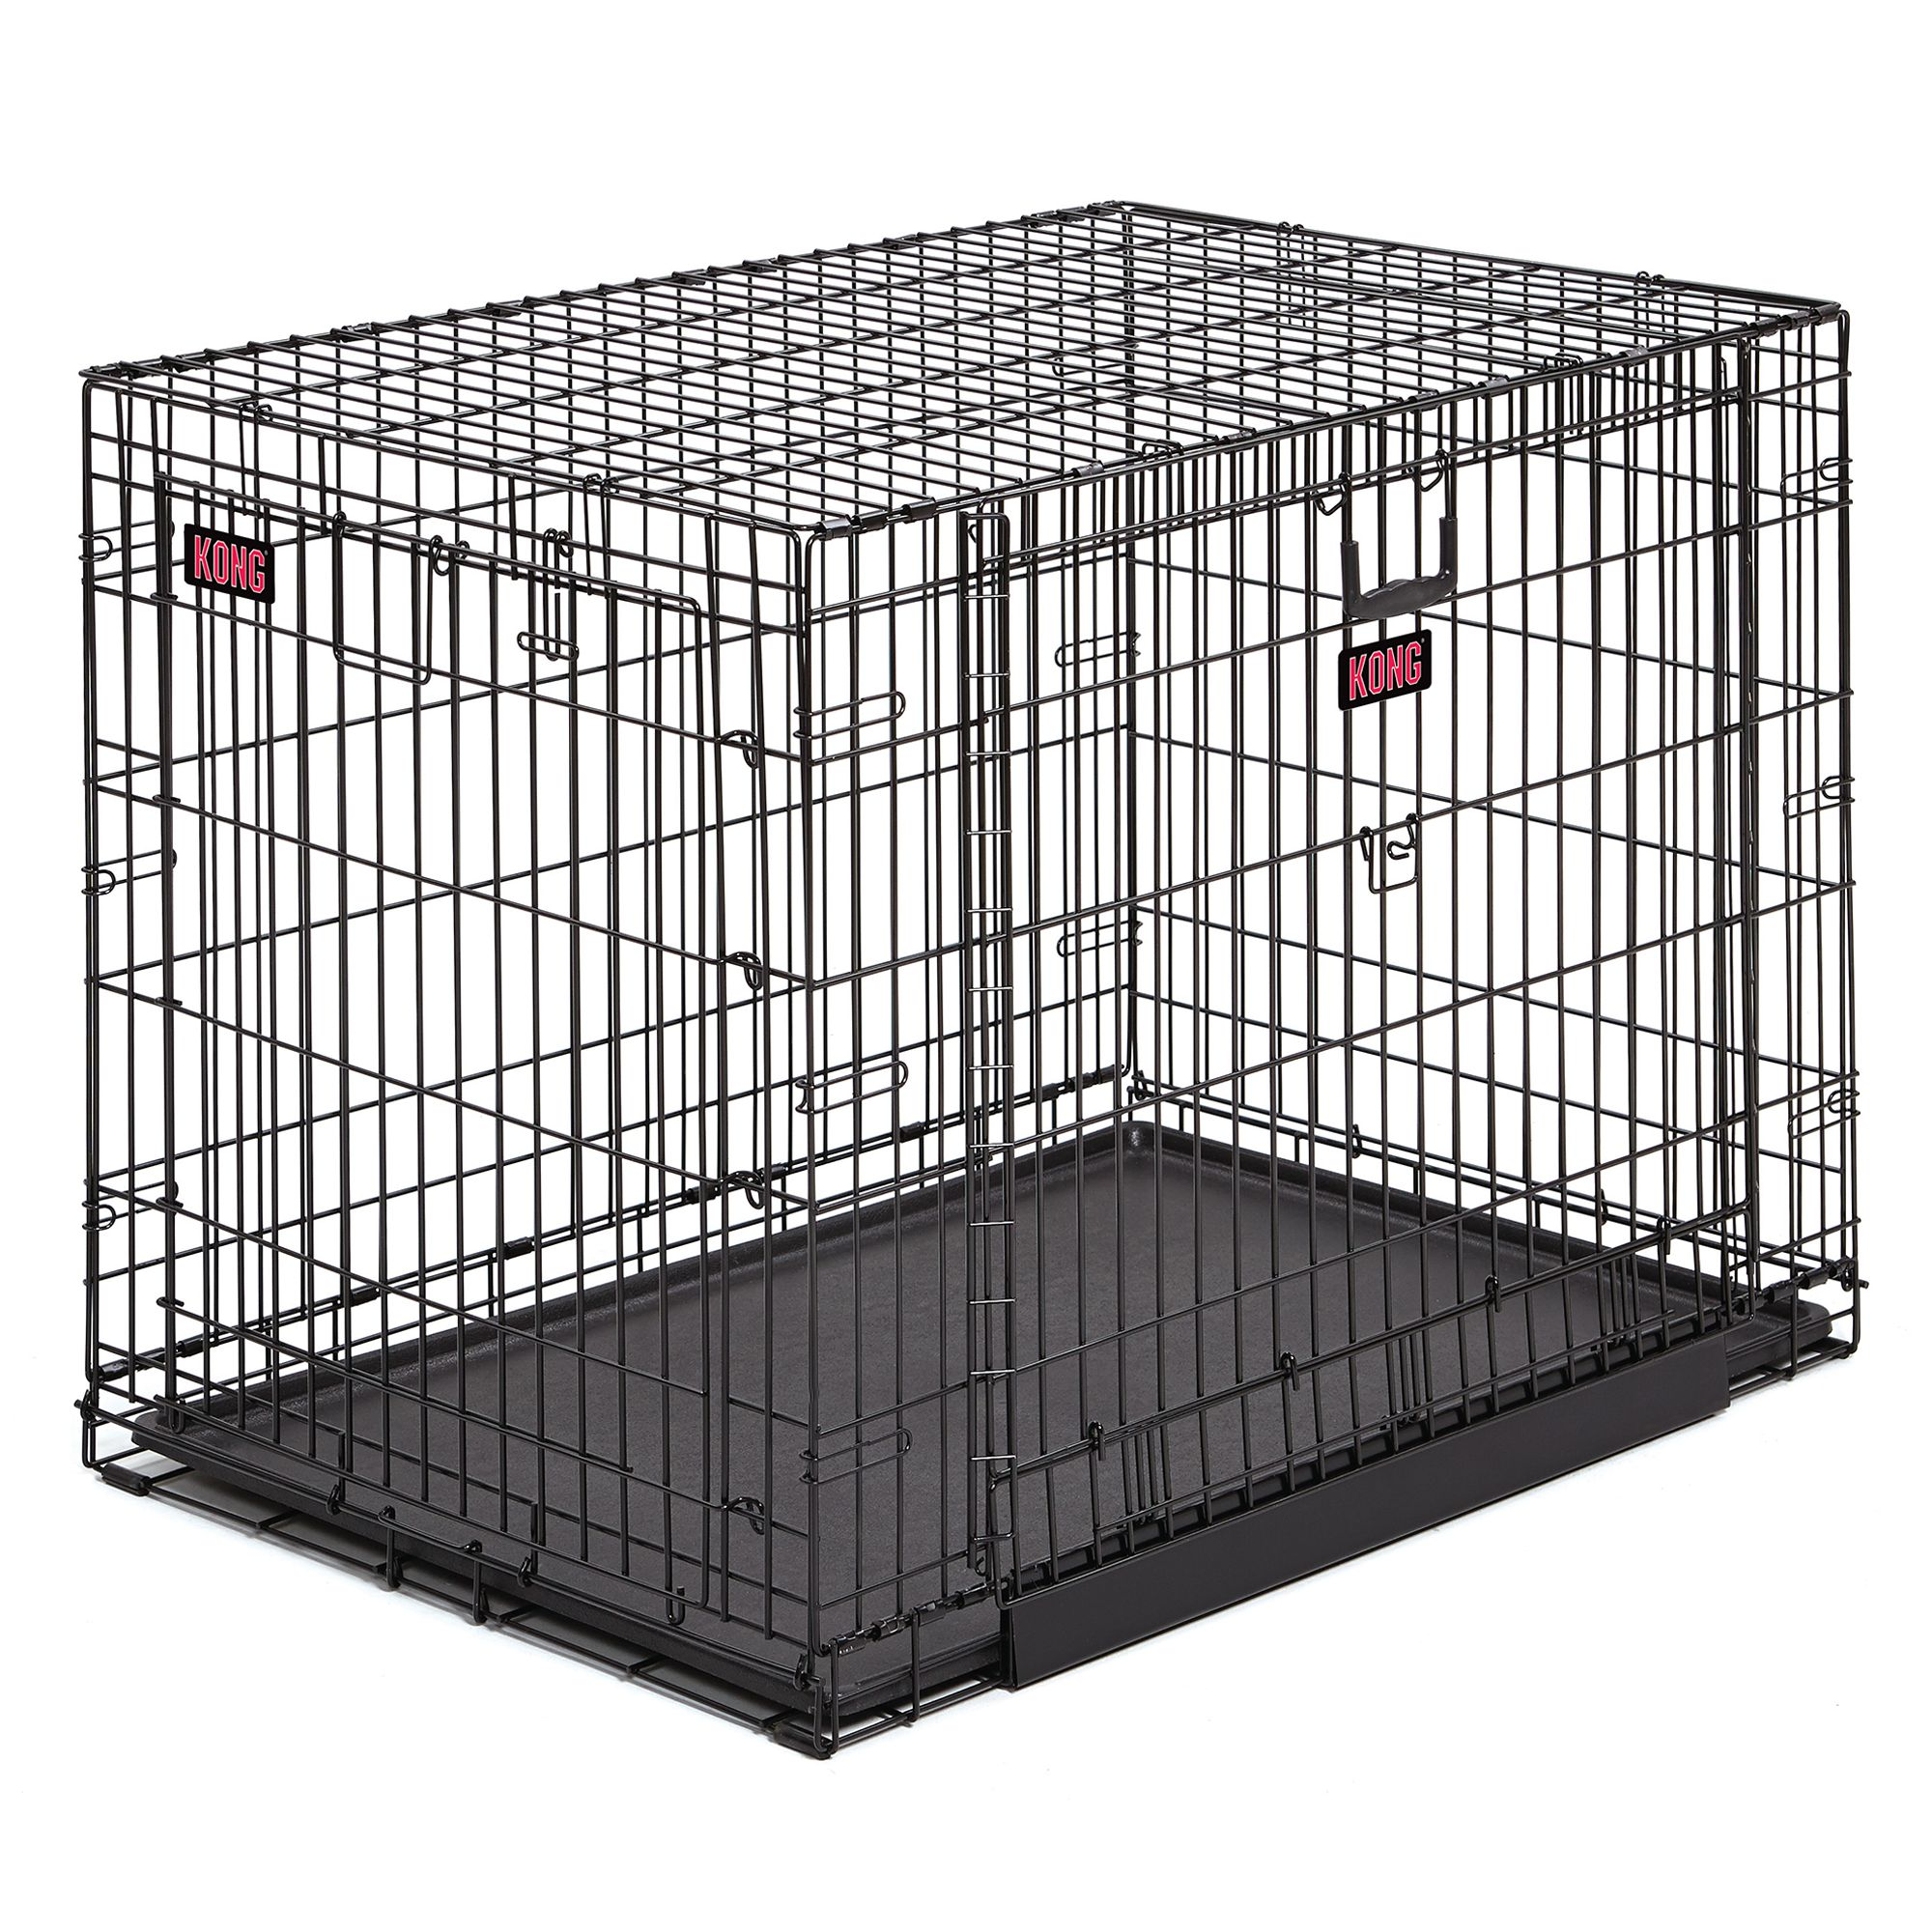 Kong Space Saving Double Door Pet Crate Size 43l X 29w X 30.5h Black